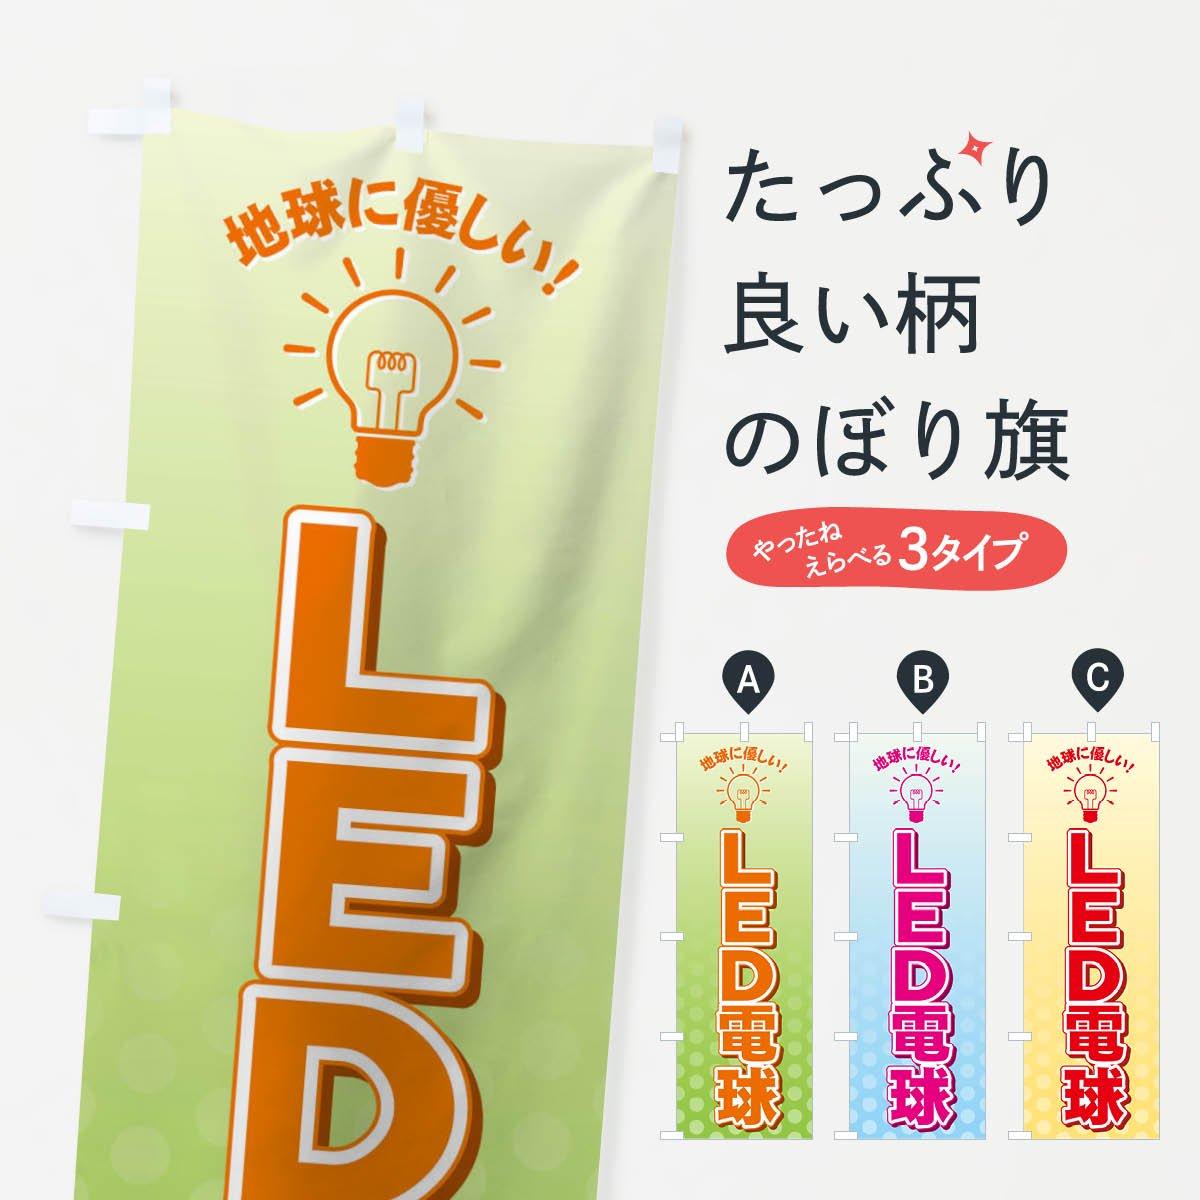 LED電球のぼり旗【電気工事】[工事(電器・電気)]